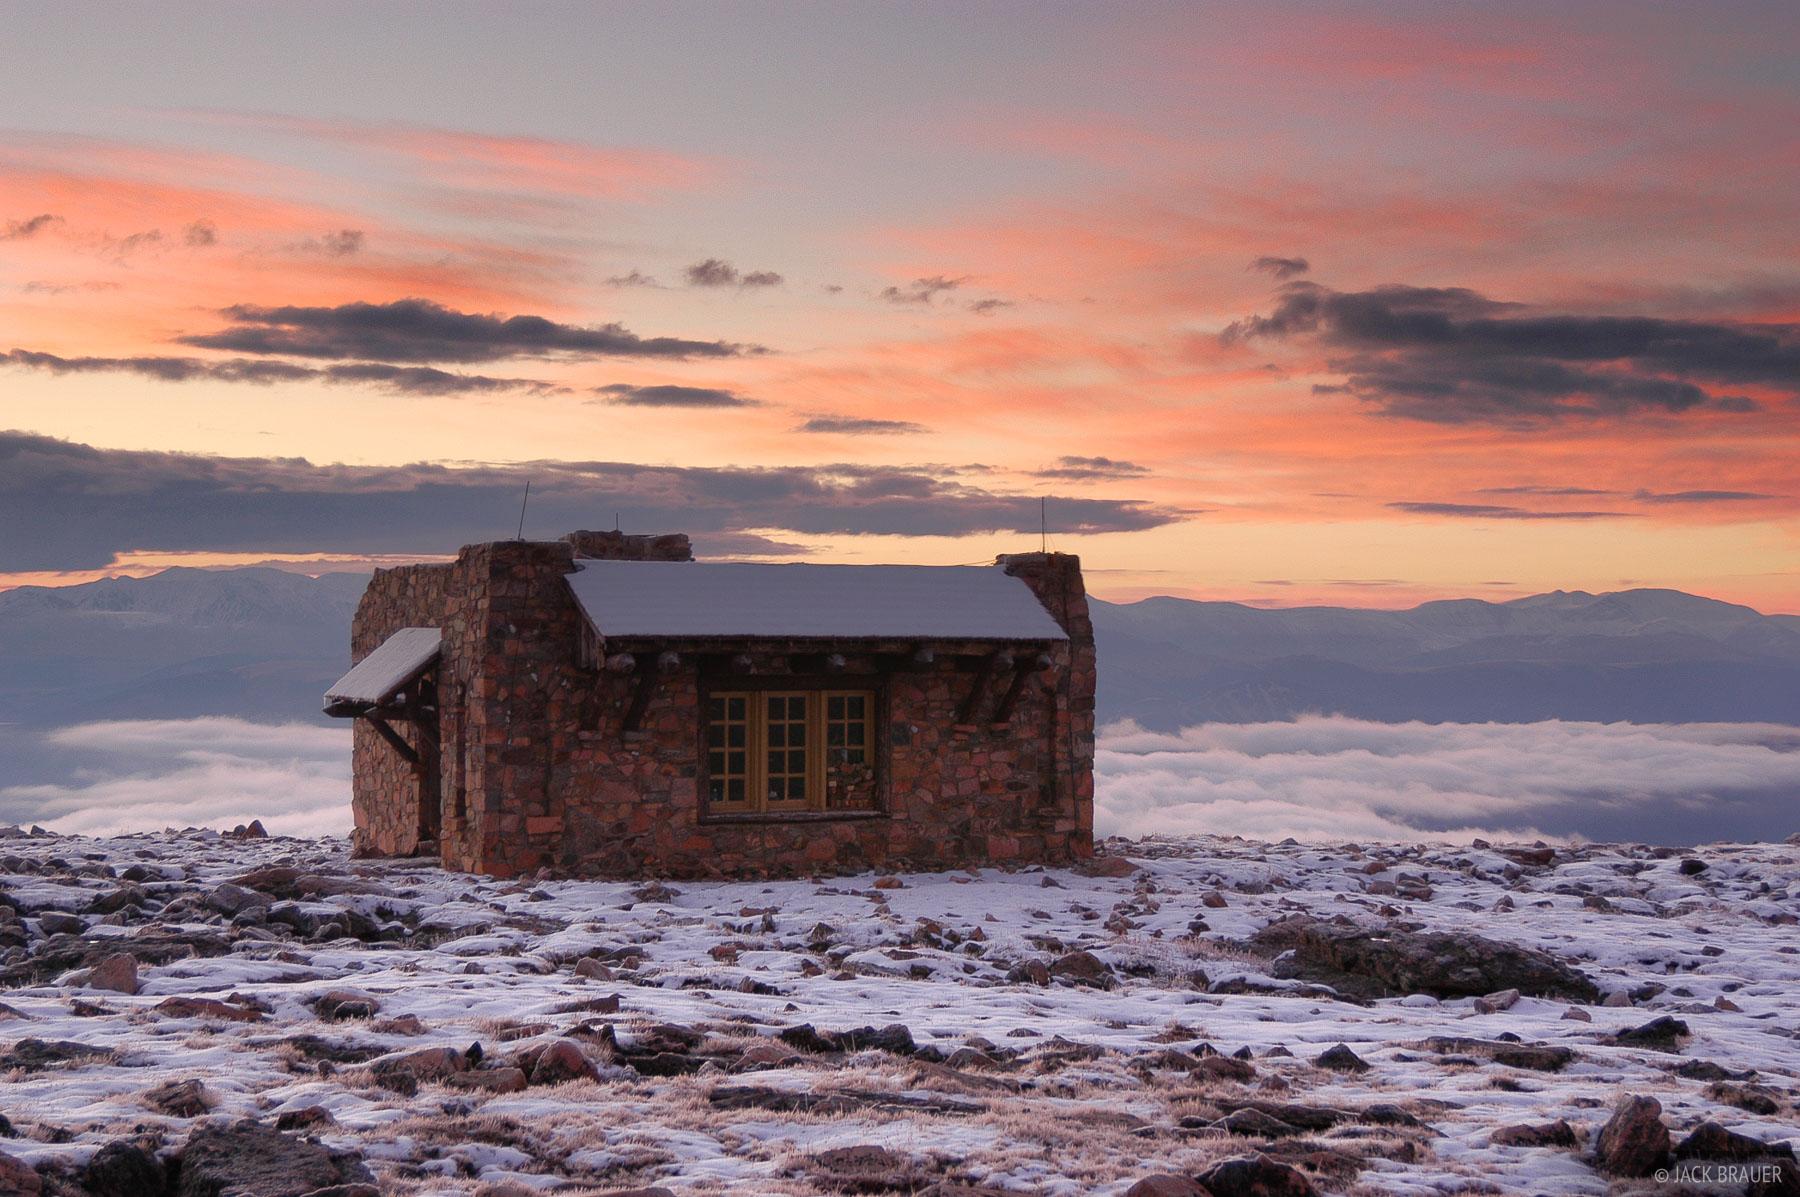 Notch Mountain, hut, sawatch range, colorado, photo